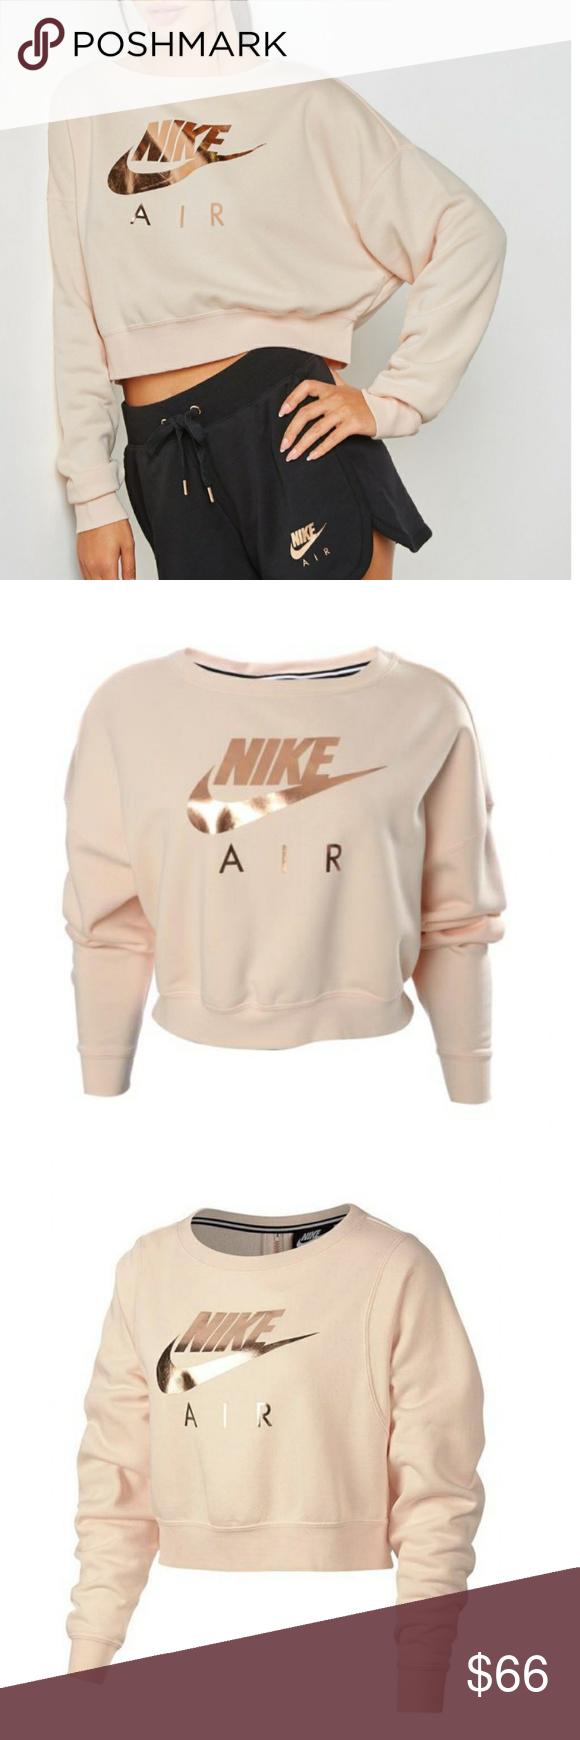 Nwt Nike Air Logo Cropped Sweatshirt Rose Gold Crop Sweatshirt Clothes Design Fashion [ 1740 x 580 Pixel ]